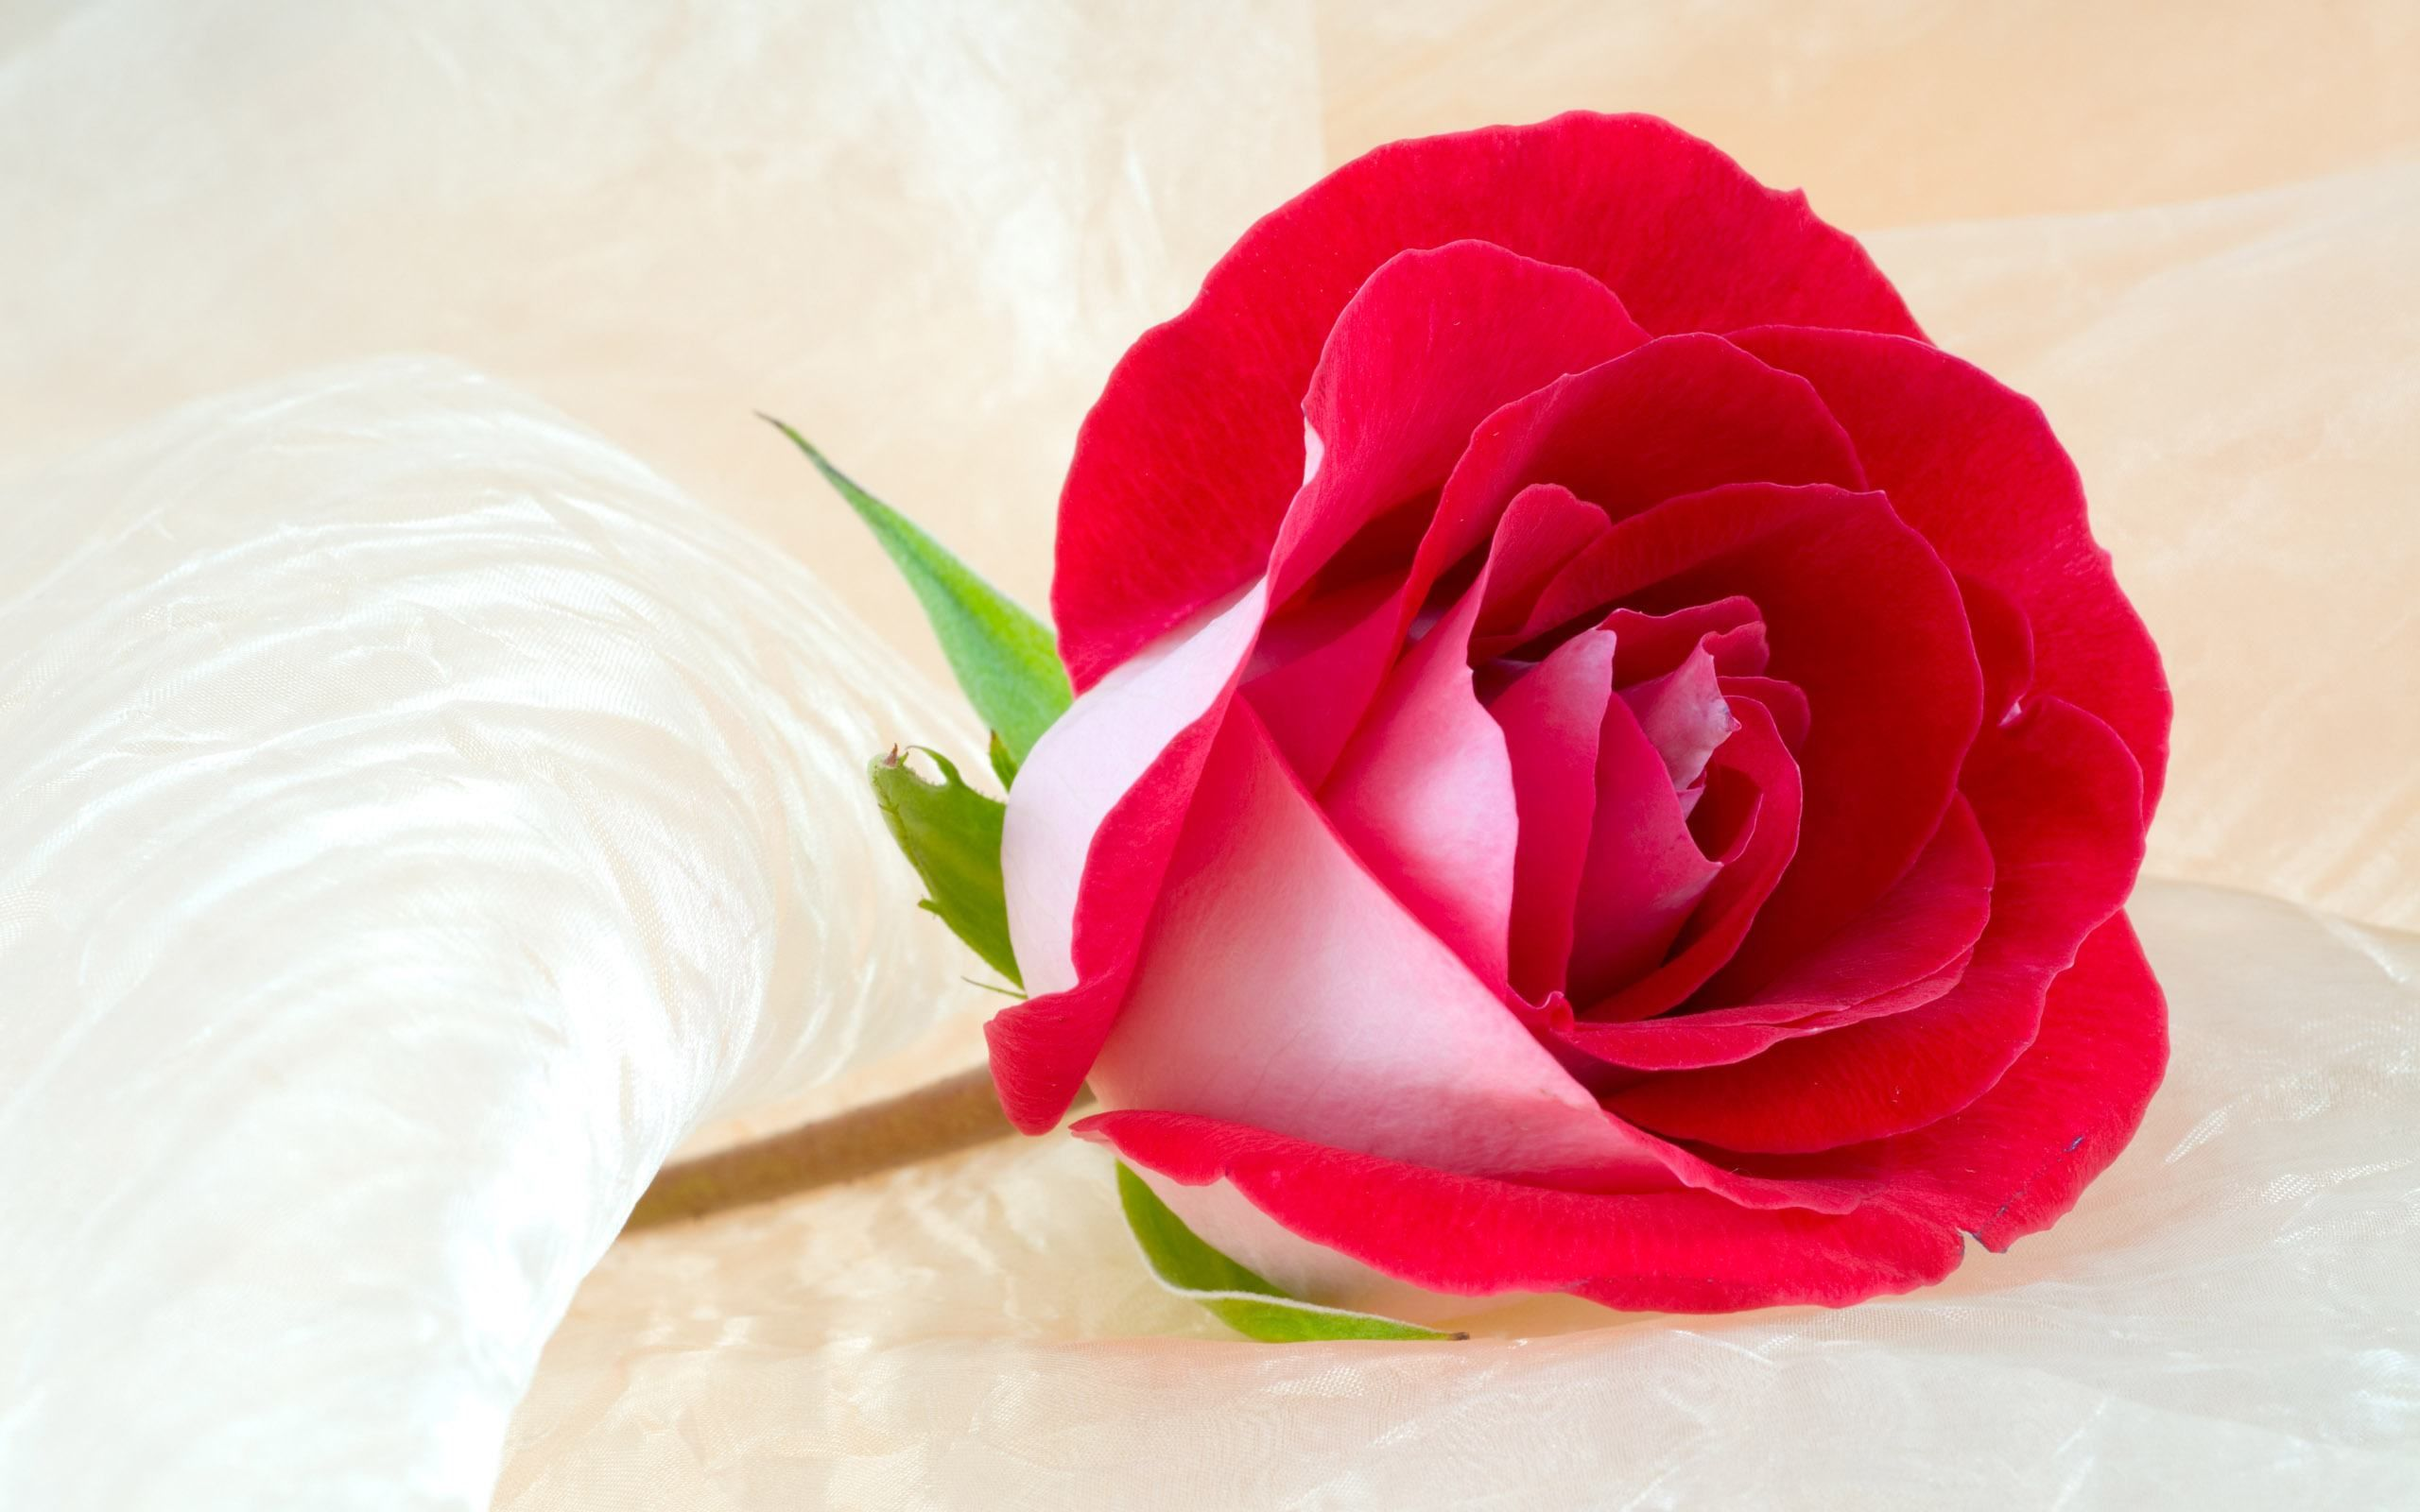 flower wallpaper hd free Download Rose flower wallpaper